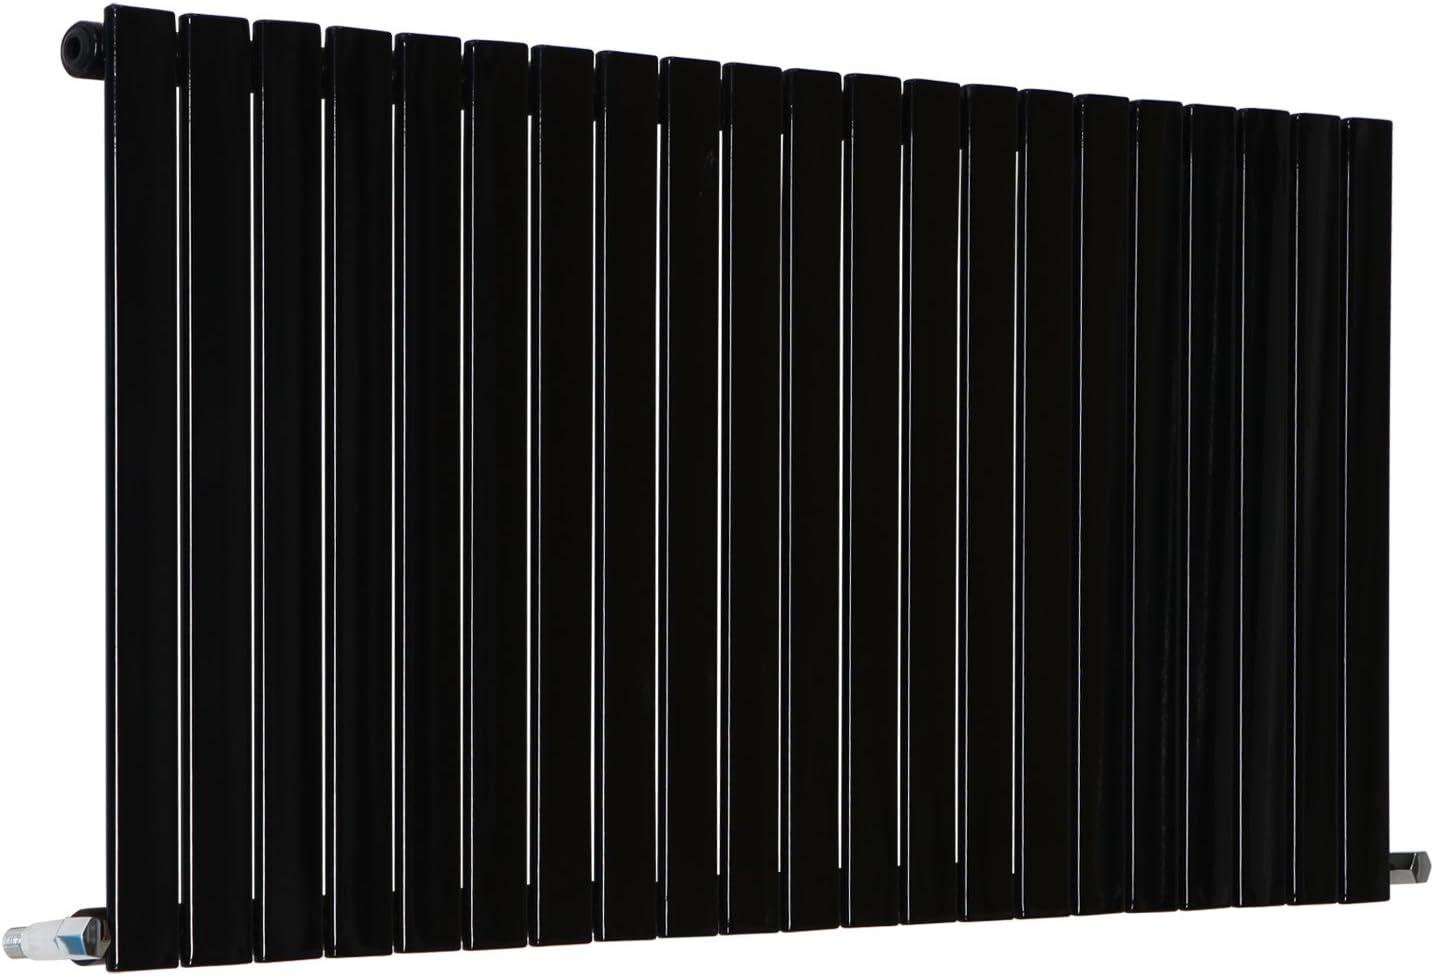 NRG 600x408mm Horizontal Flat Panel Designer Radiator Bathroom Heater Central Heating Rad Double Column Black